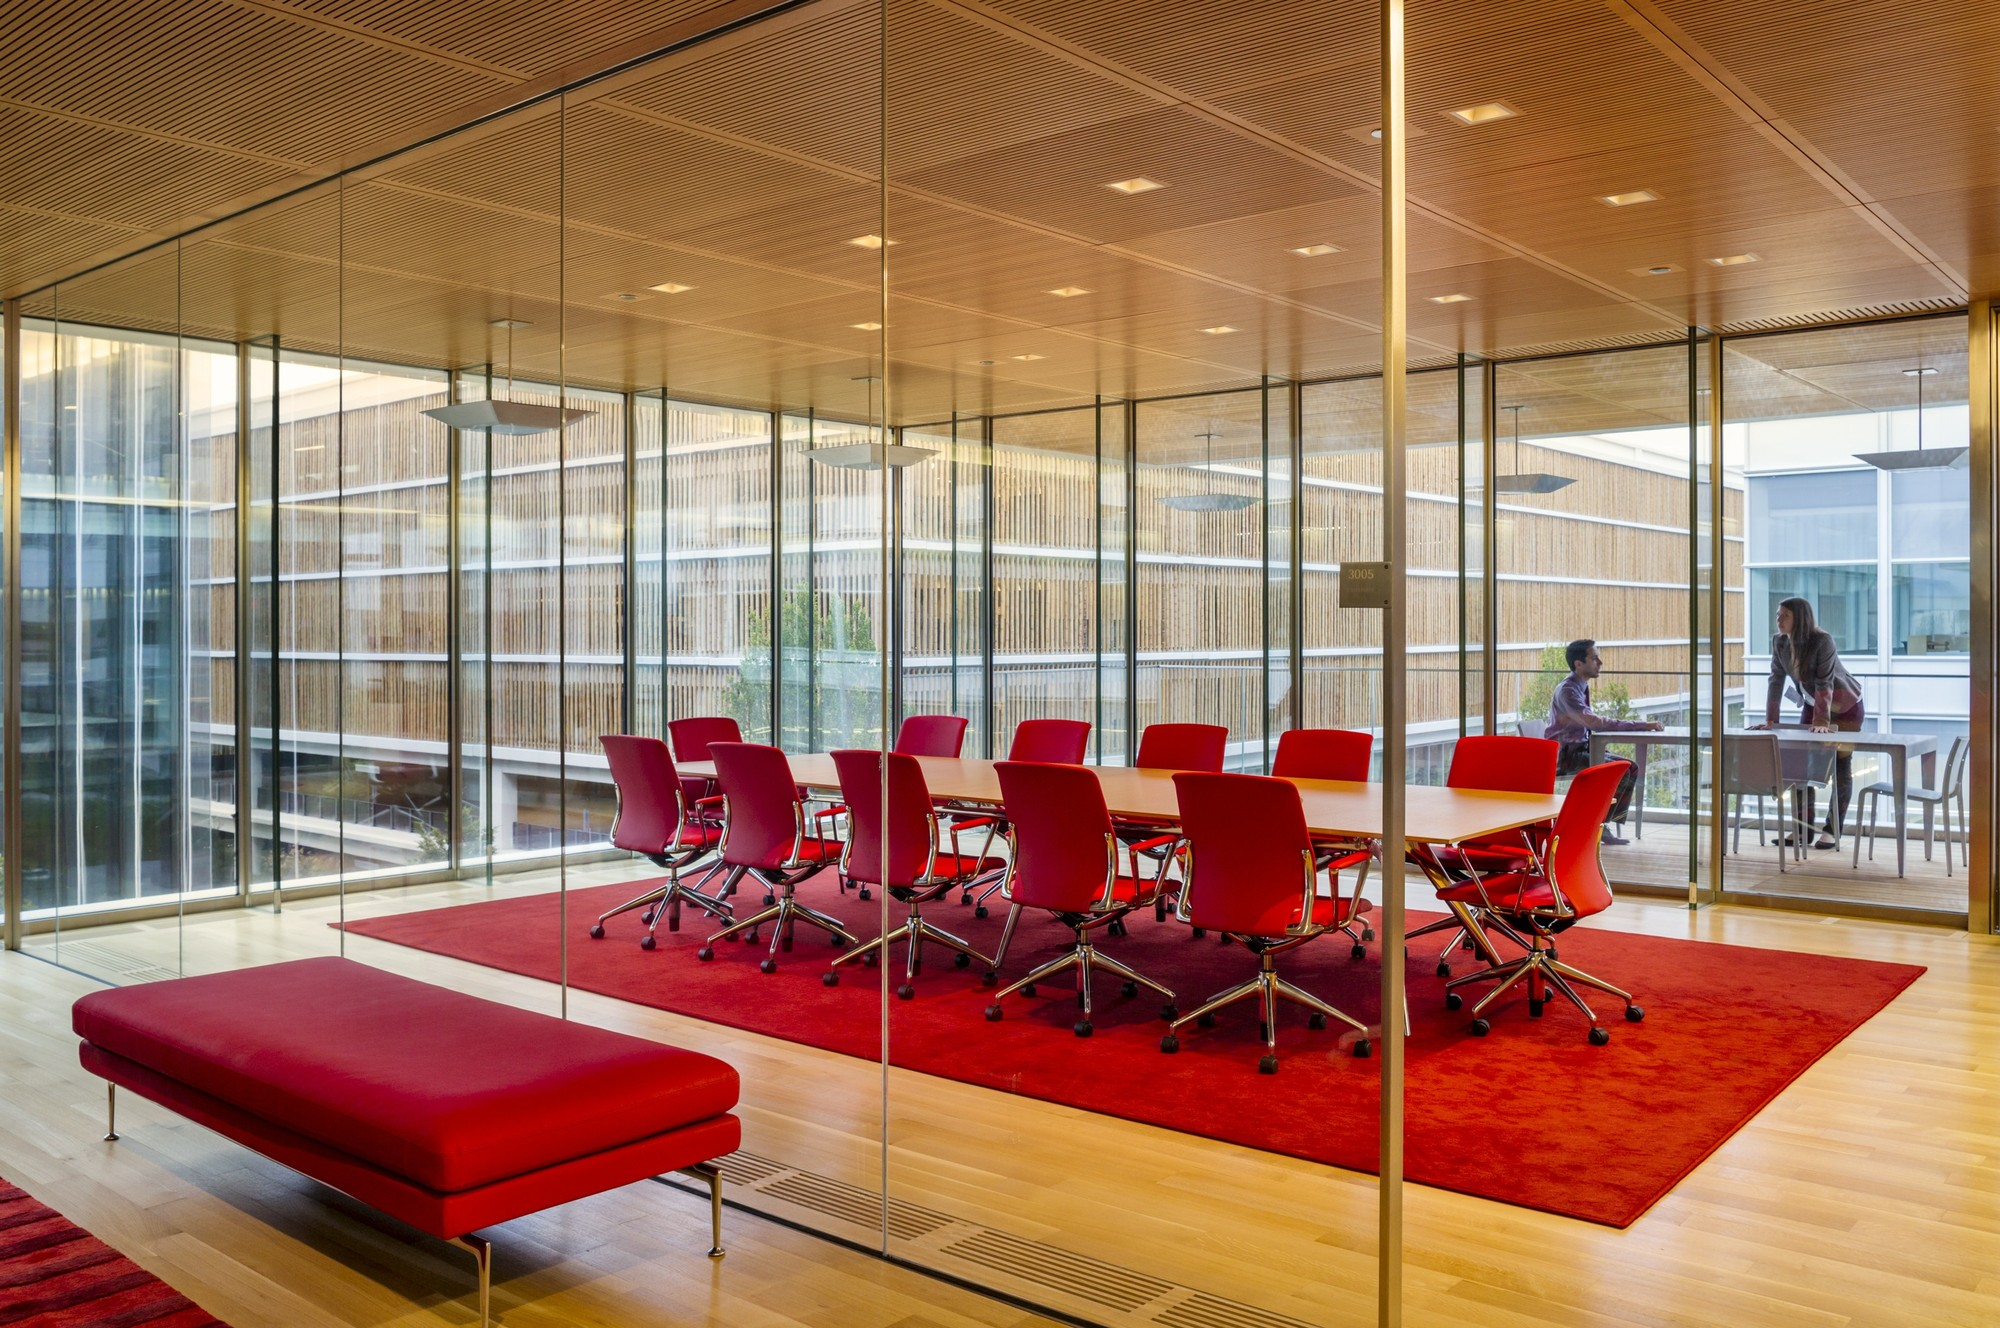 Gallery of novartis campus weiss manfredi 5 for Designs east florist interior